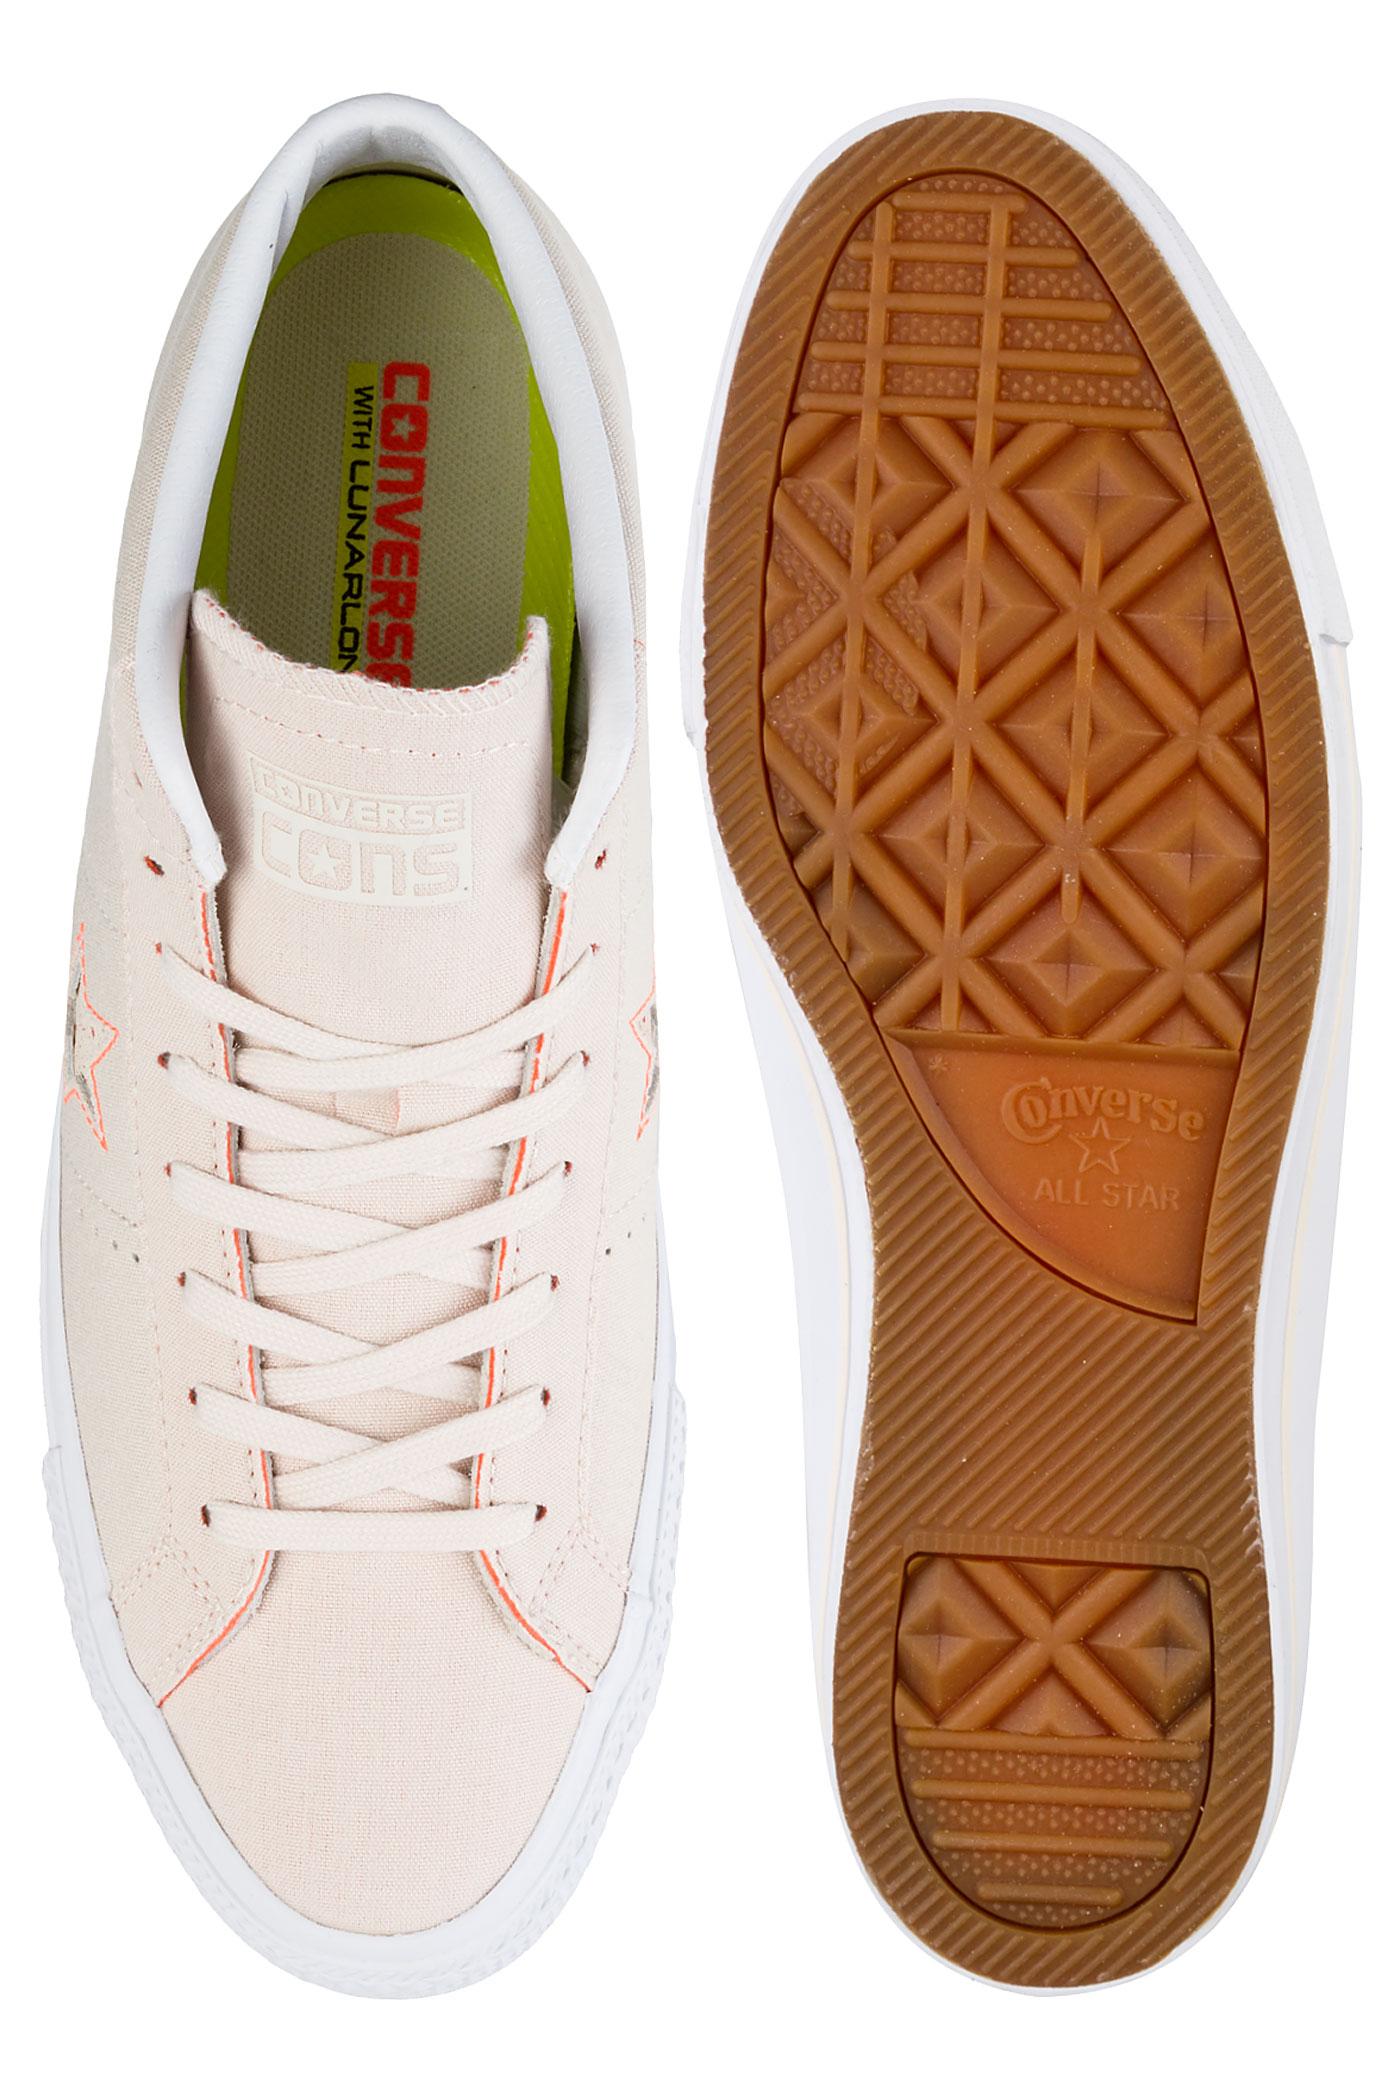 793c46221b5 ... Converse One Star Pro Mid Chaussure (natural hyper orange white) ...